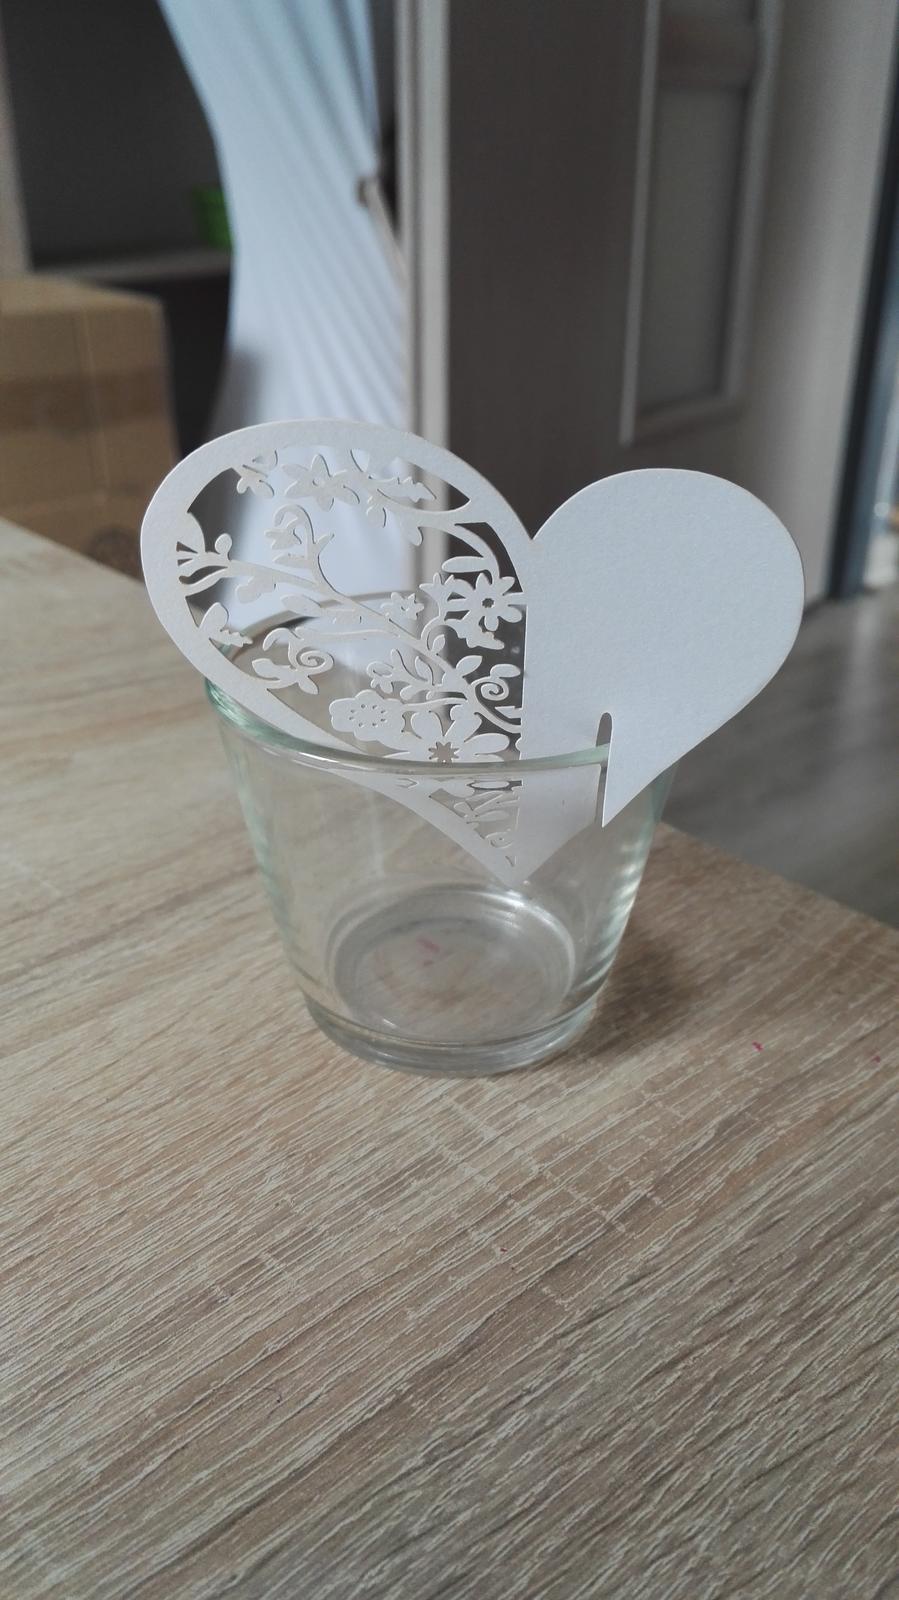 Menovka srdce - Obrázok č. 1